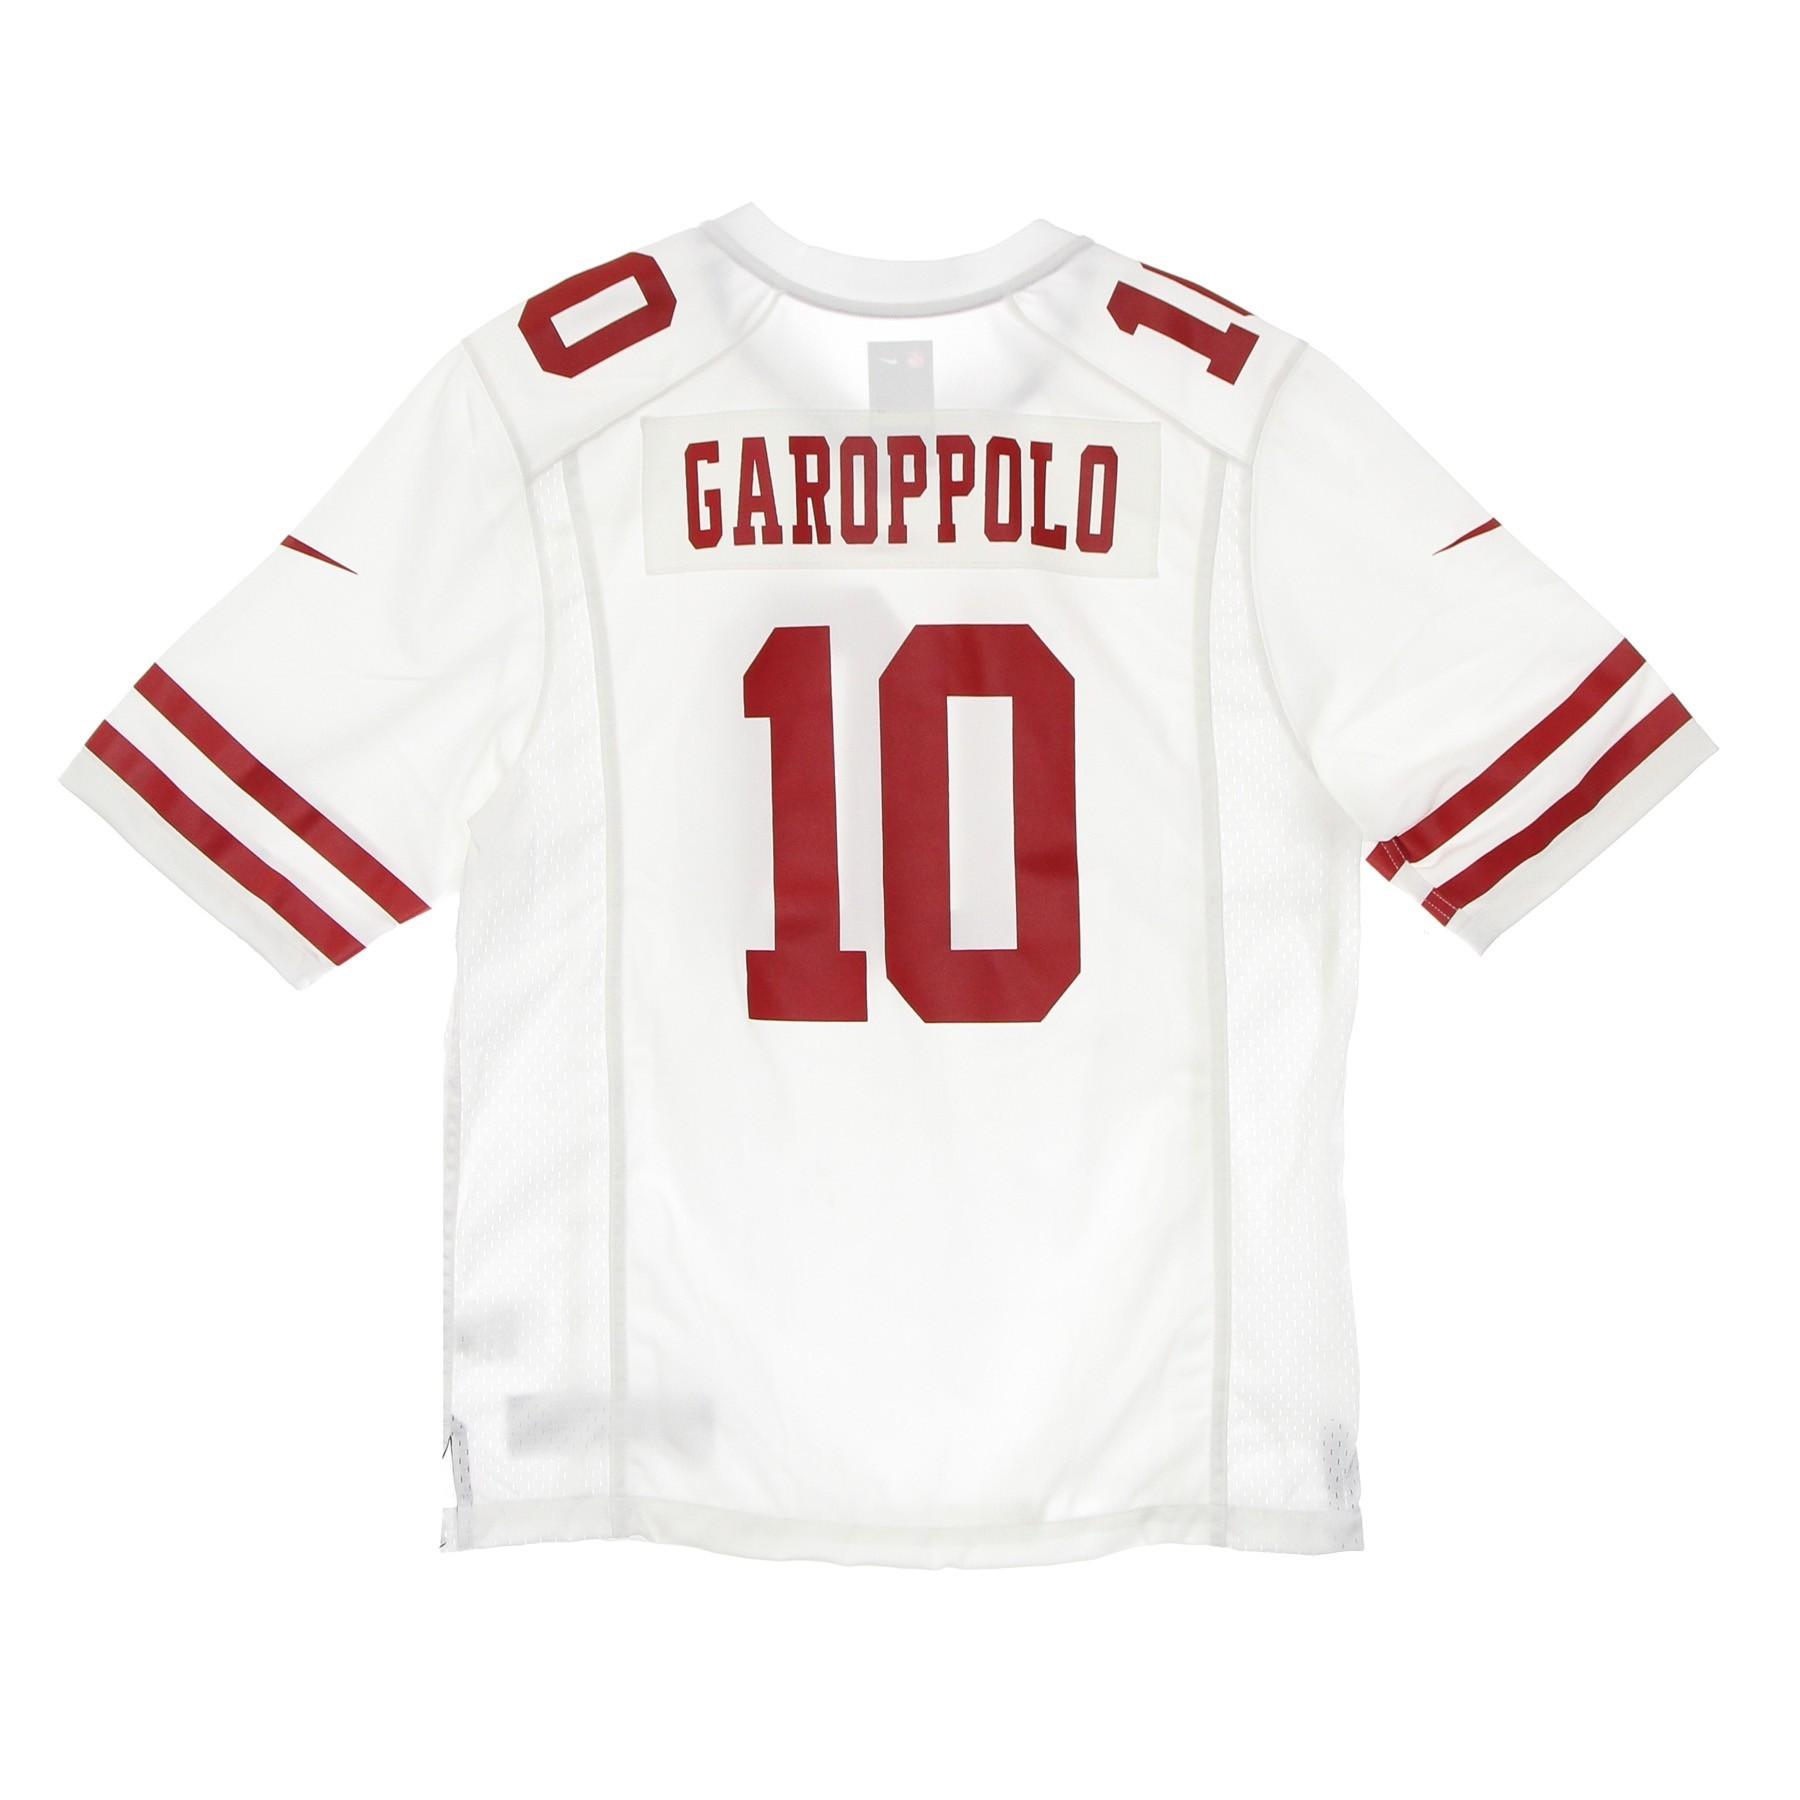 casacca football americano uomo nfl game road jersey no.10 garoppolo saf49e M